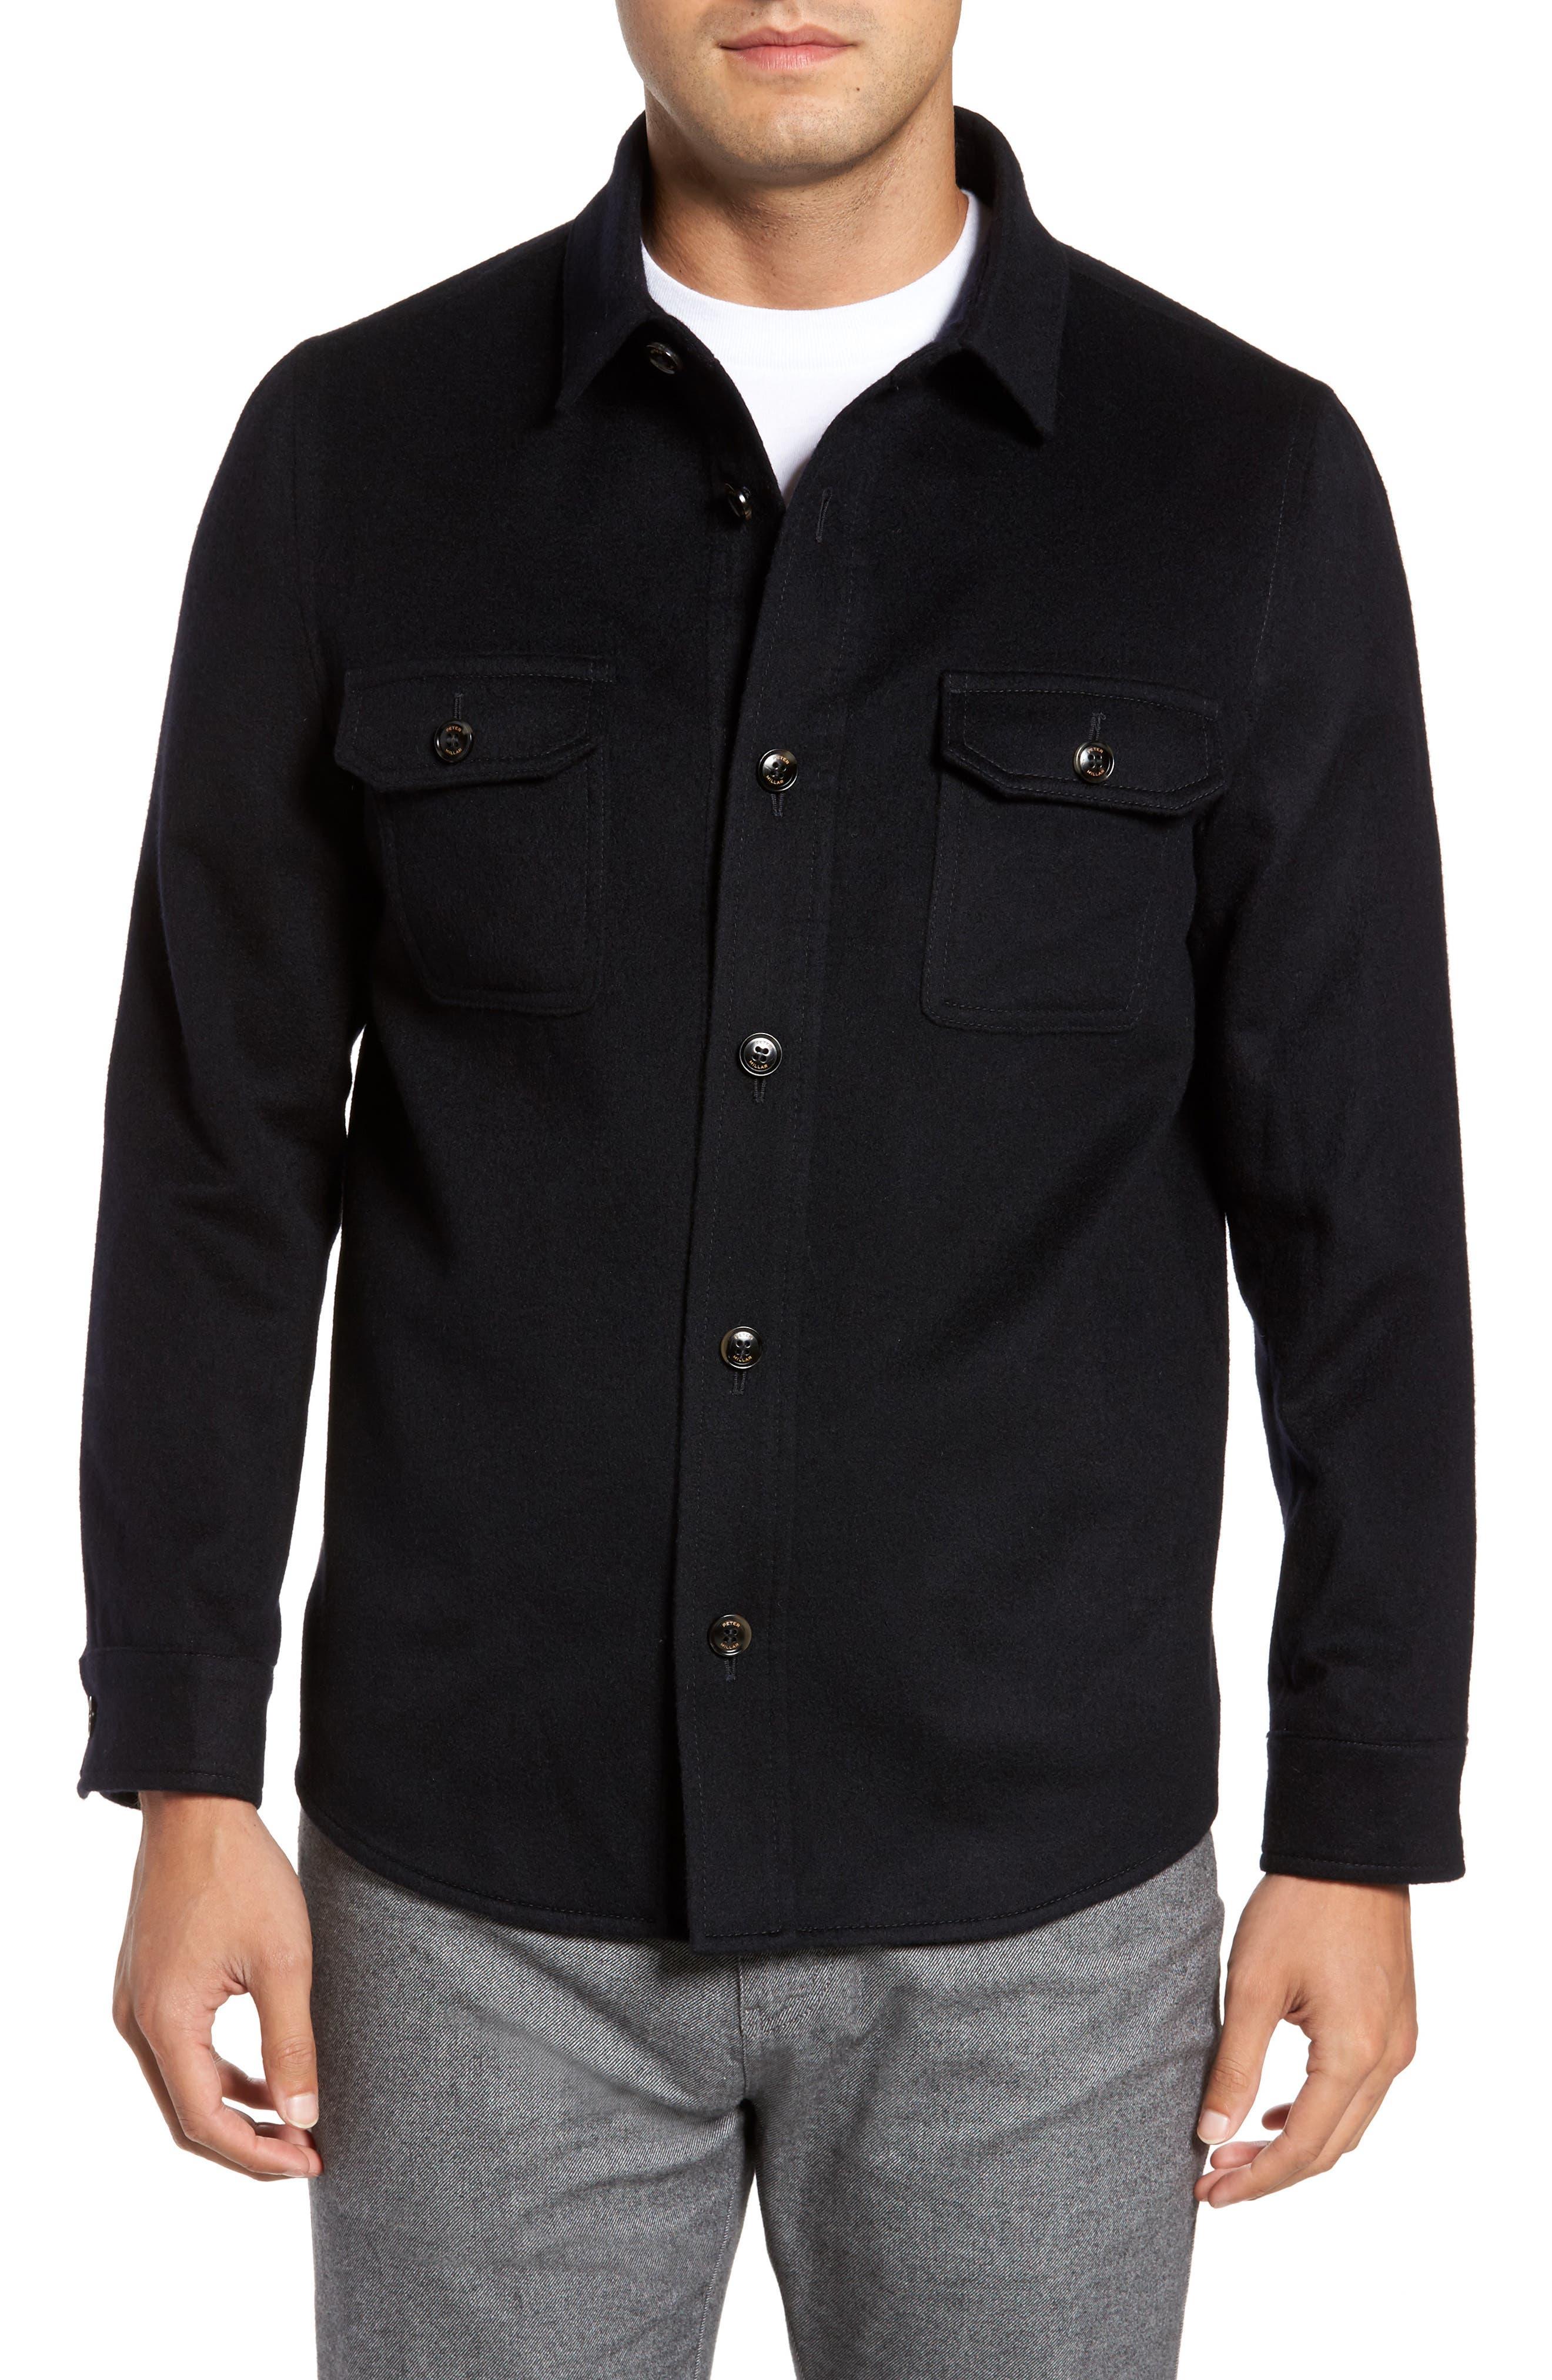 Alternate Image 1 Selected - Peter Millar Collection Featherweight Journeyman Cashmere Shirt Jacket